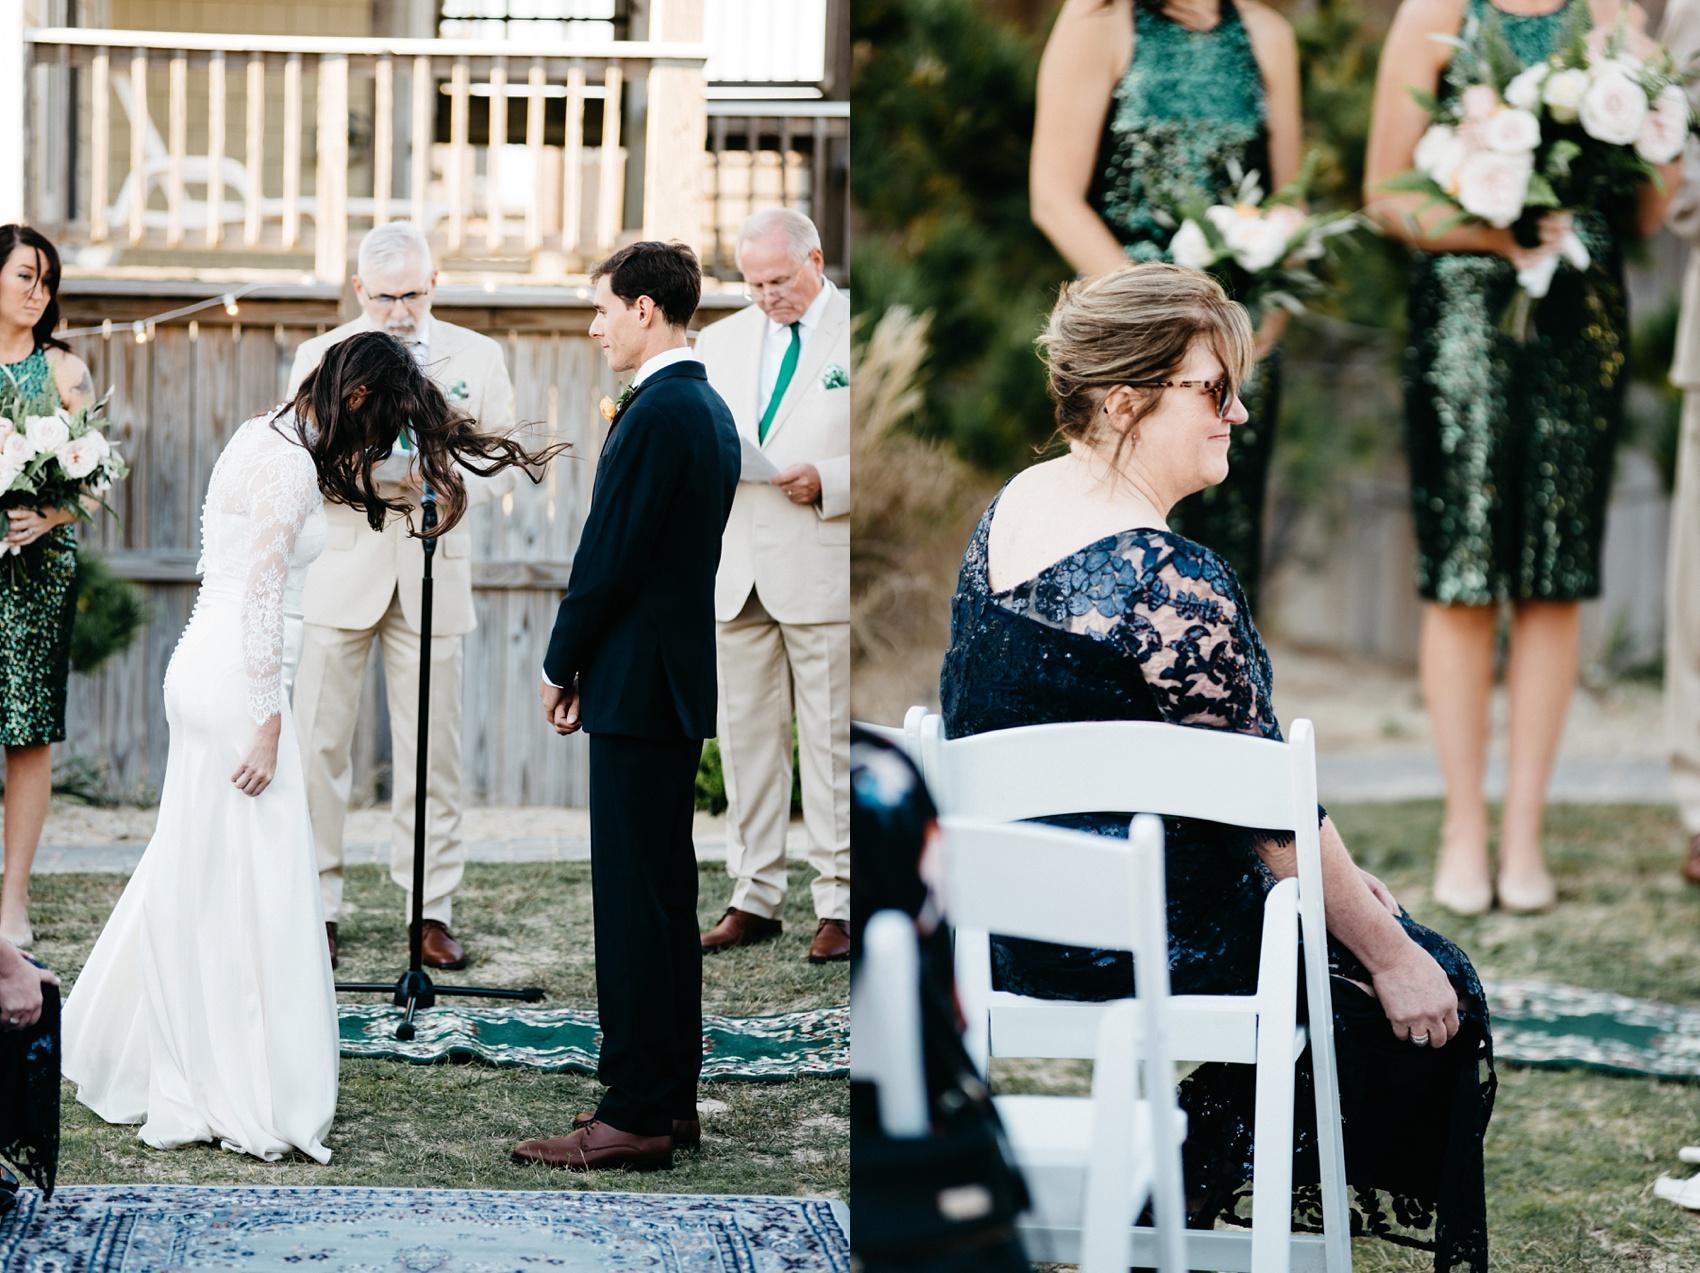 outerbanks_wedding_photographer_1283.jpg